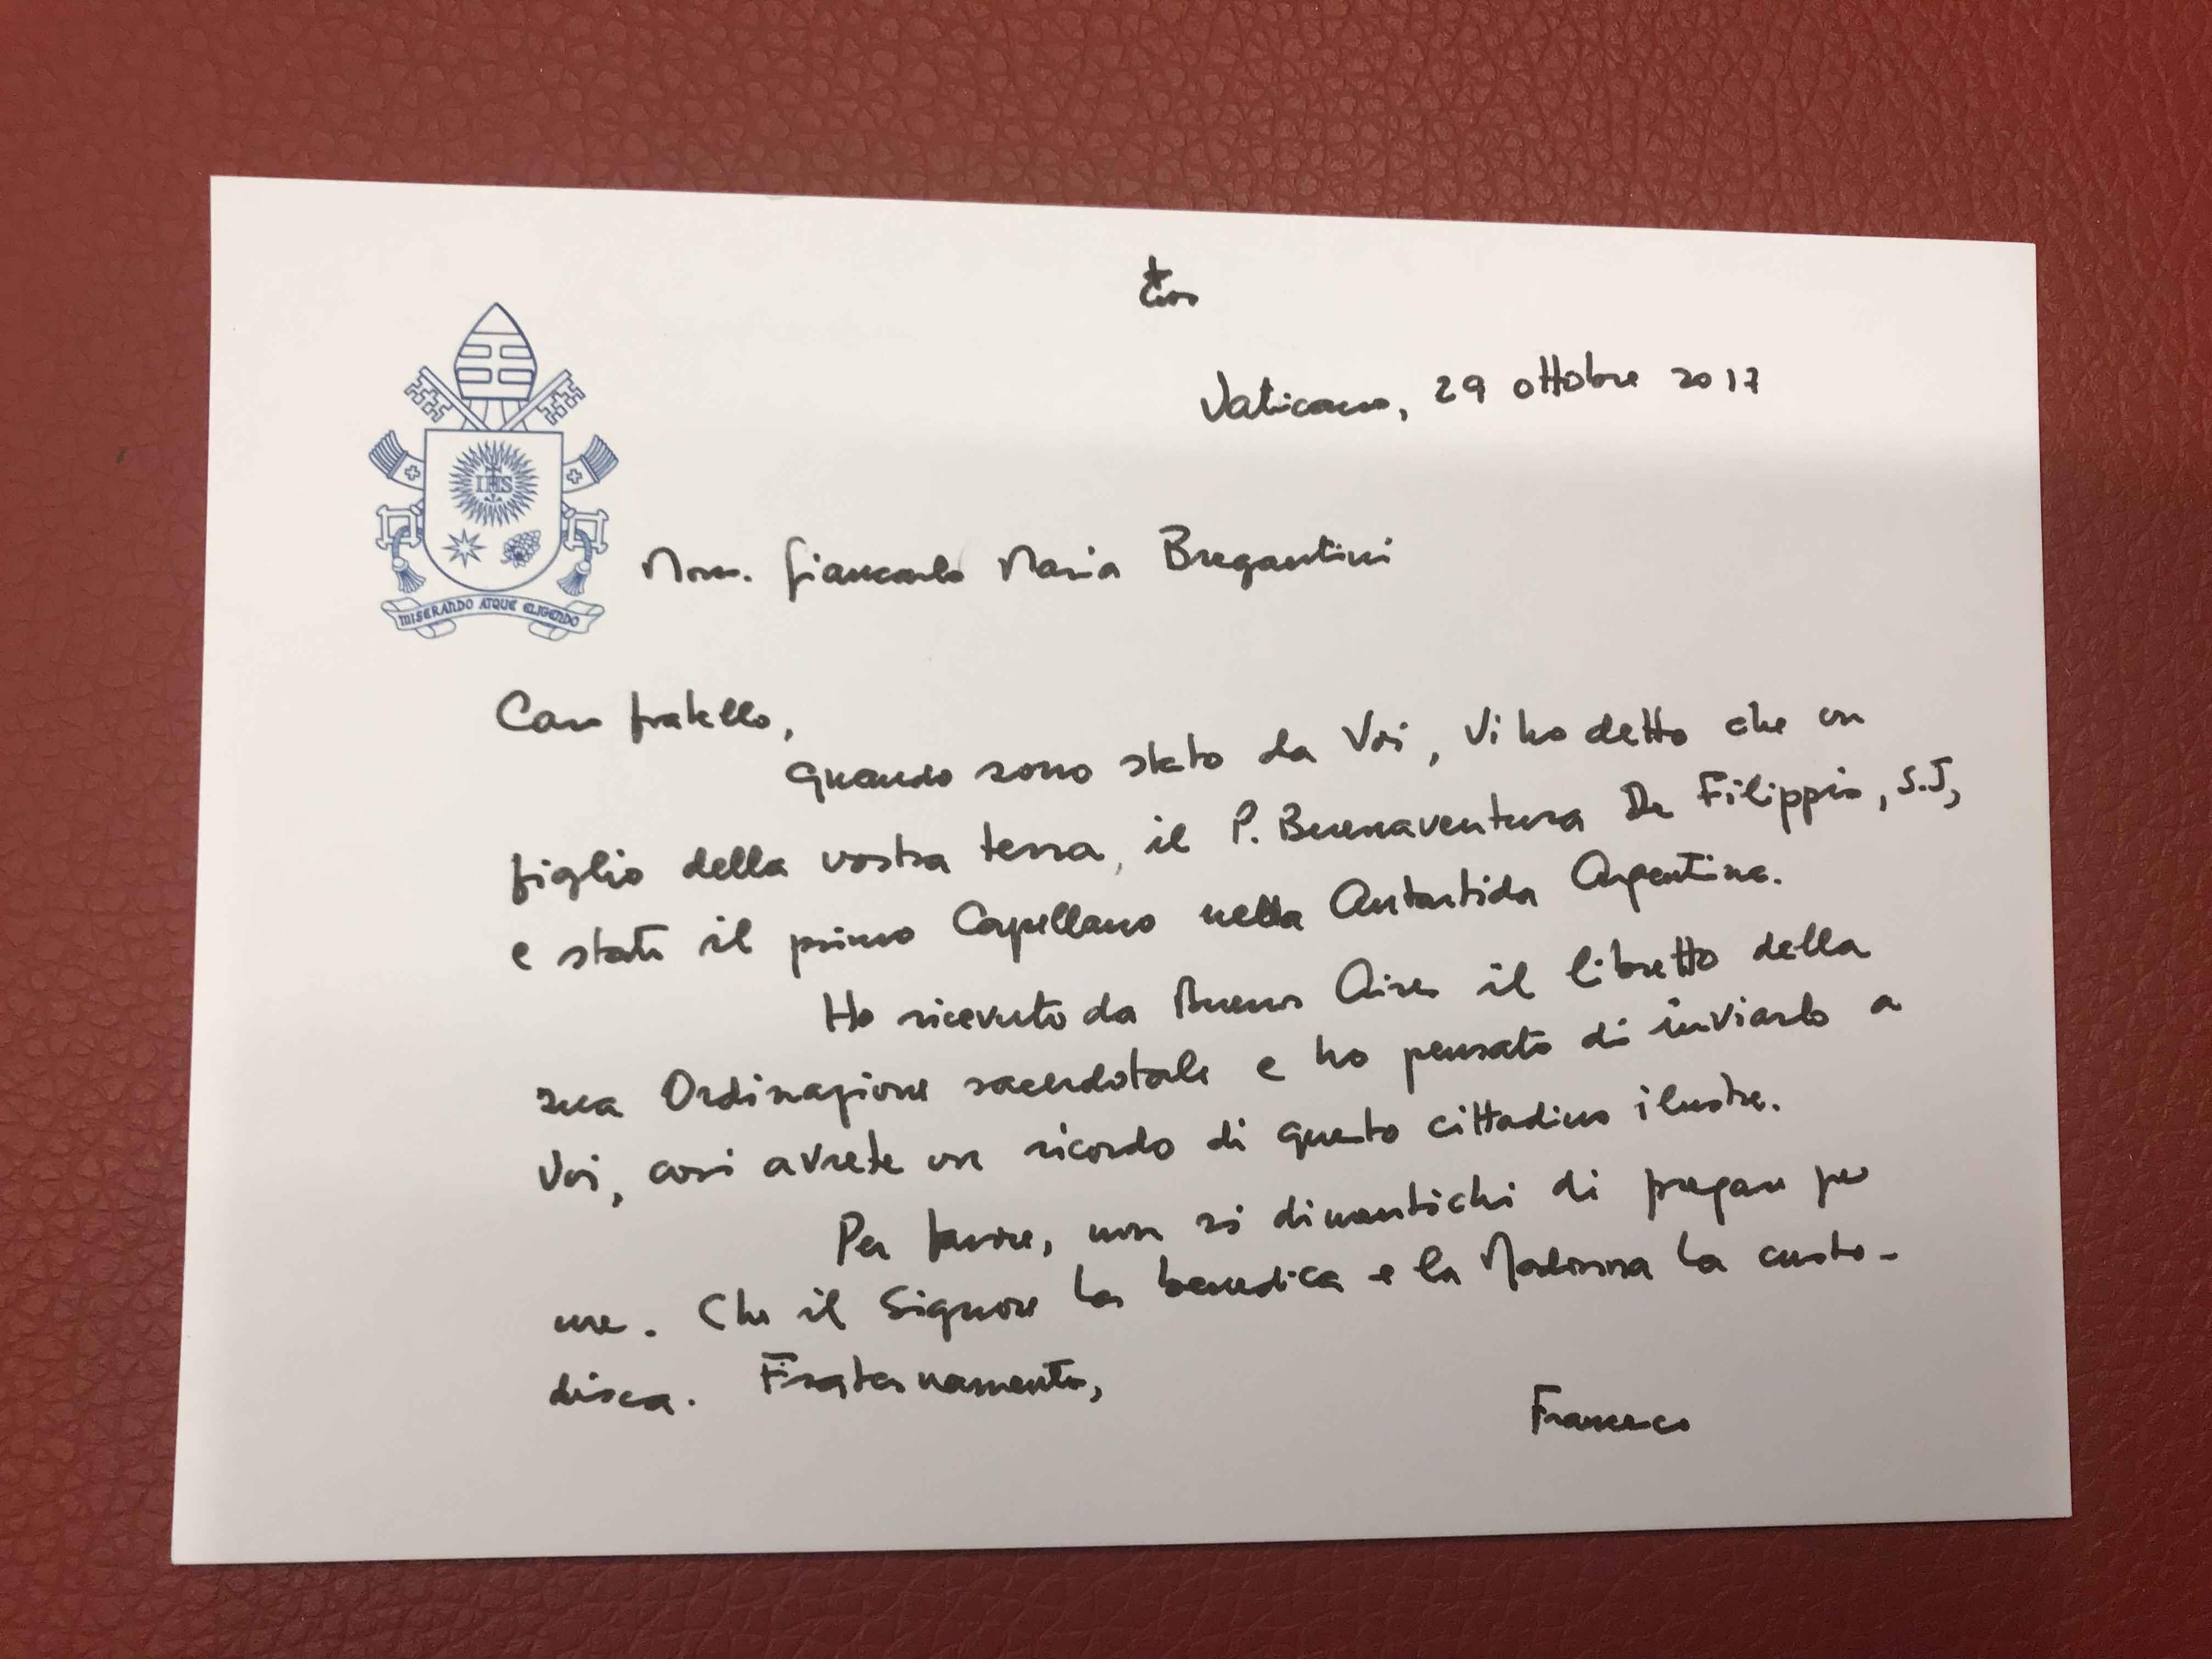 Papa Francesco ricorda Bonaventura De Filippis in una lettera a Monsignor Bregantini